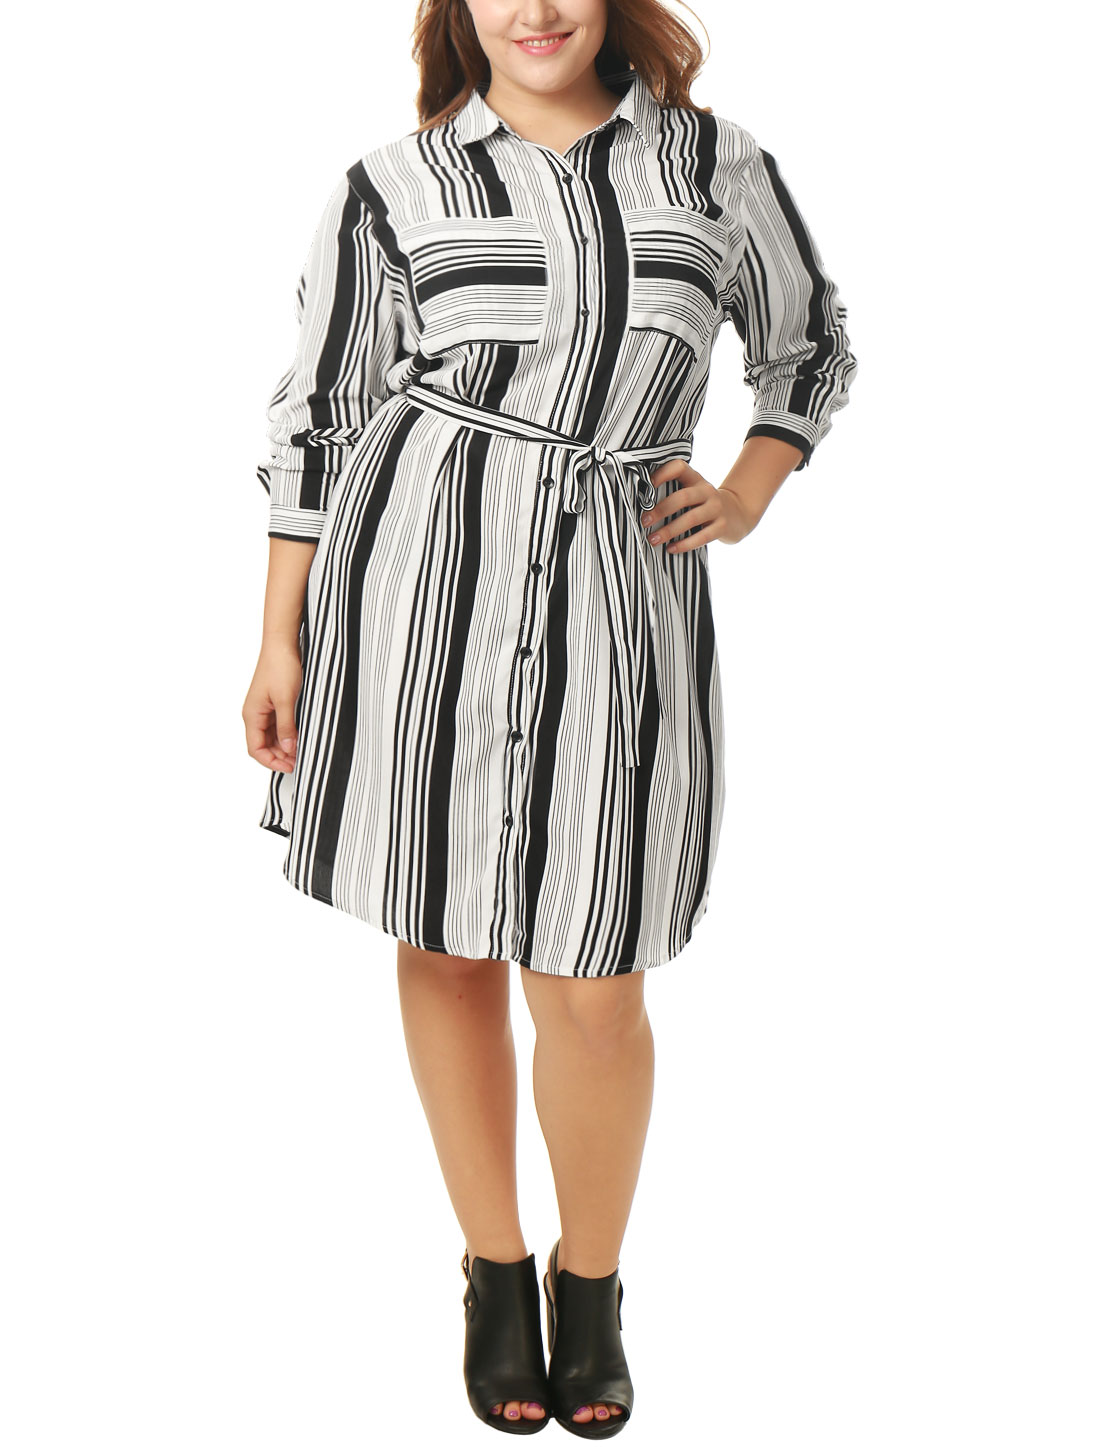 Women Plus Size Striped Tie Waist Long Sleeves Shirt Dress Black White 3X